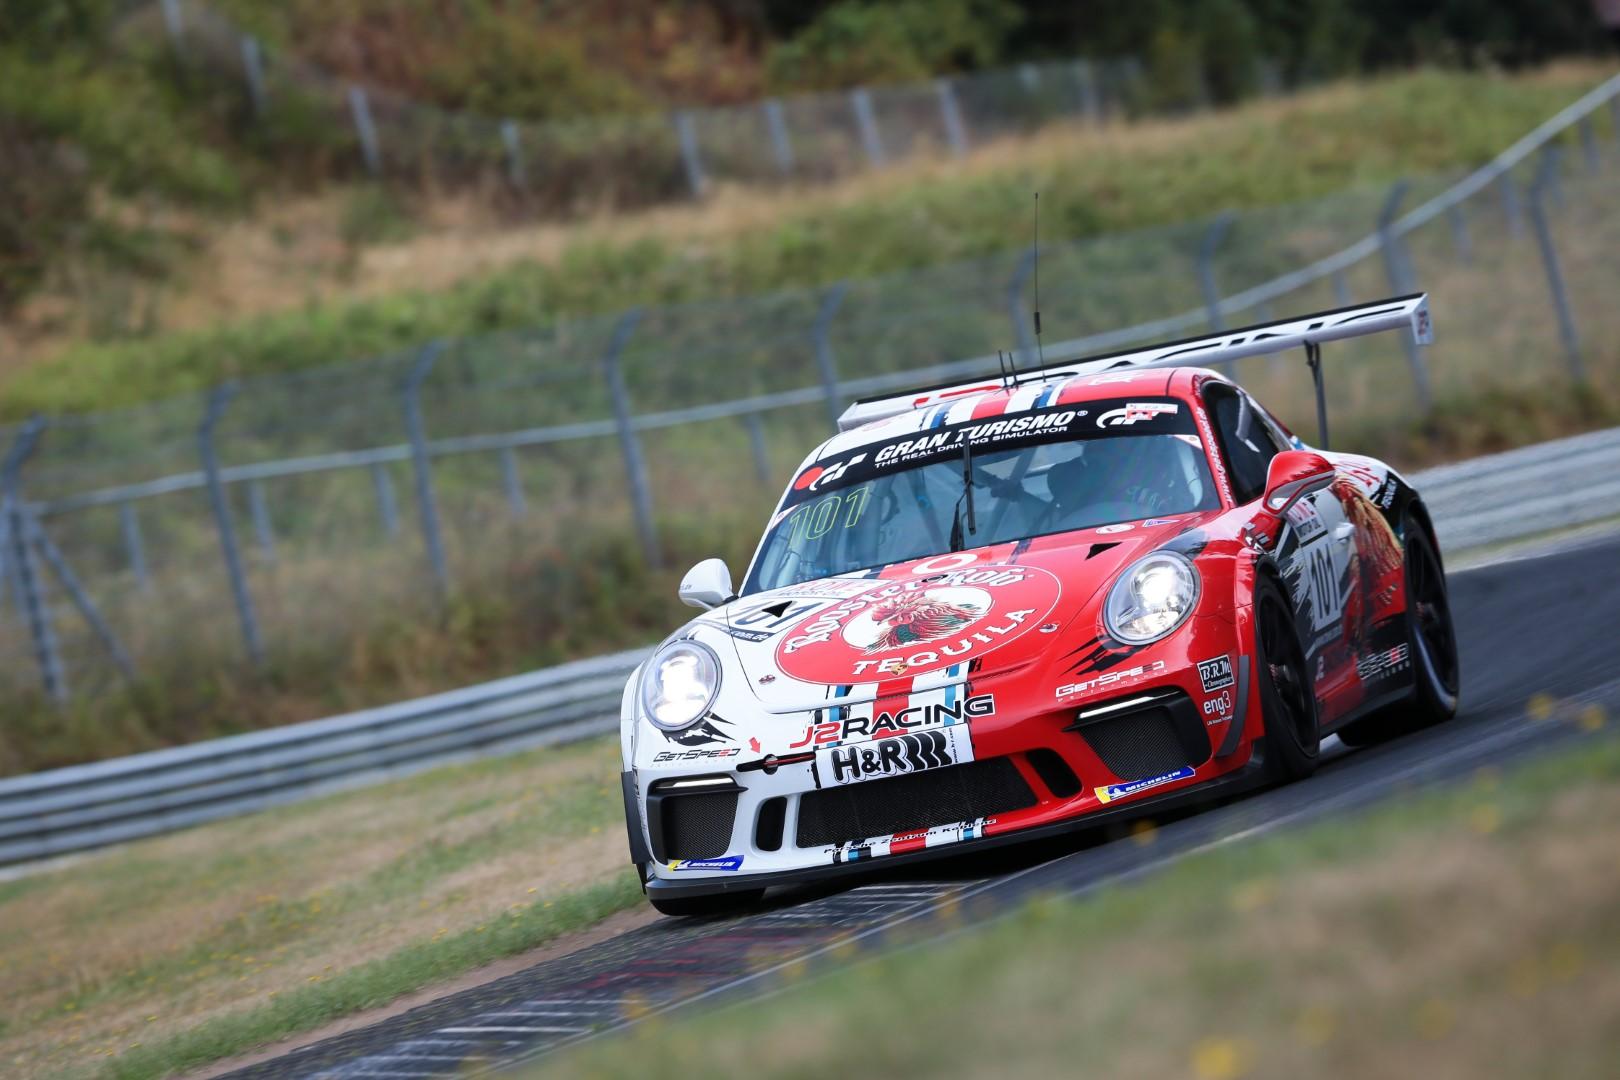 VLN 6. Lauf 2018, Nürburgring-Nordschleife - Foto: Gruppe C Photography; #101 Porsche 911 GT3 Cup, GIGASPEED Team GetSpeed Performance: John Shoffner, Janine Hill, Arno Klasen